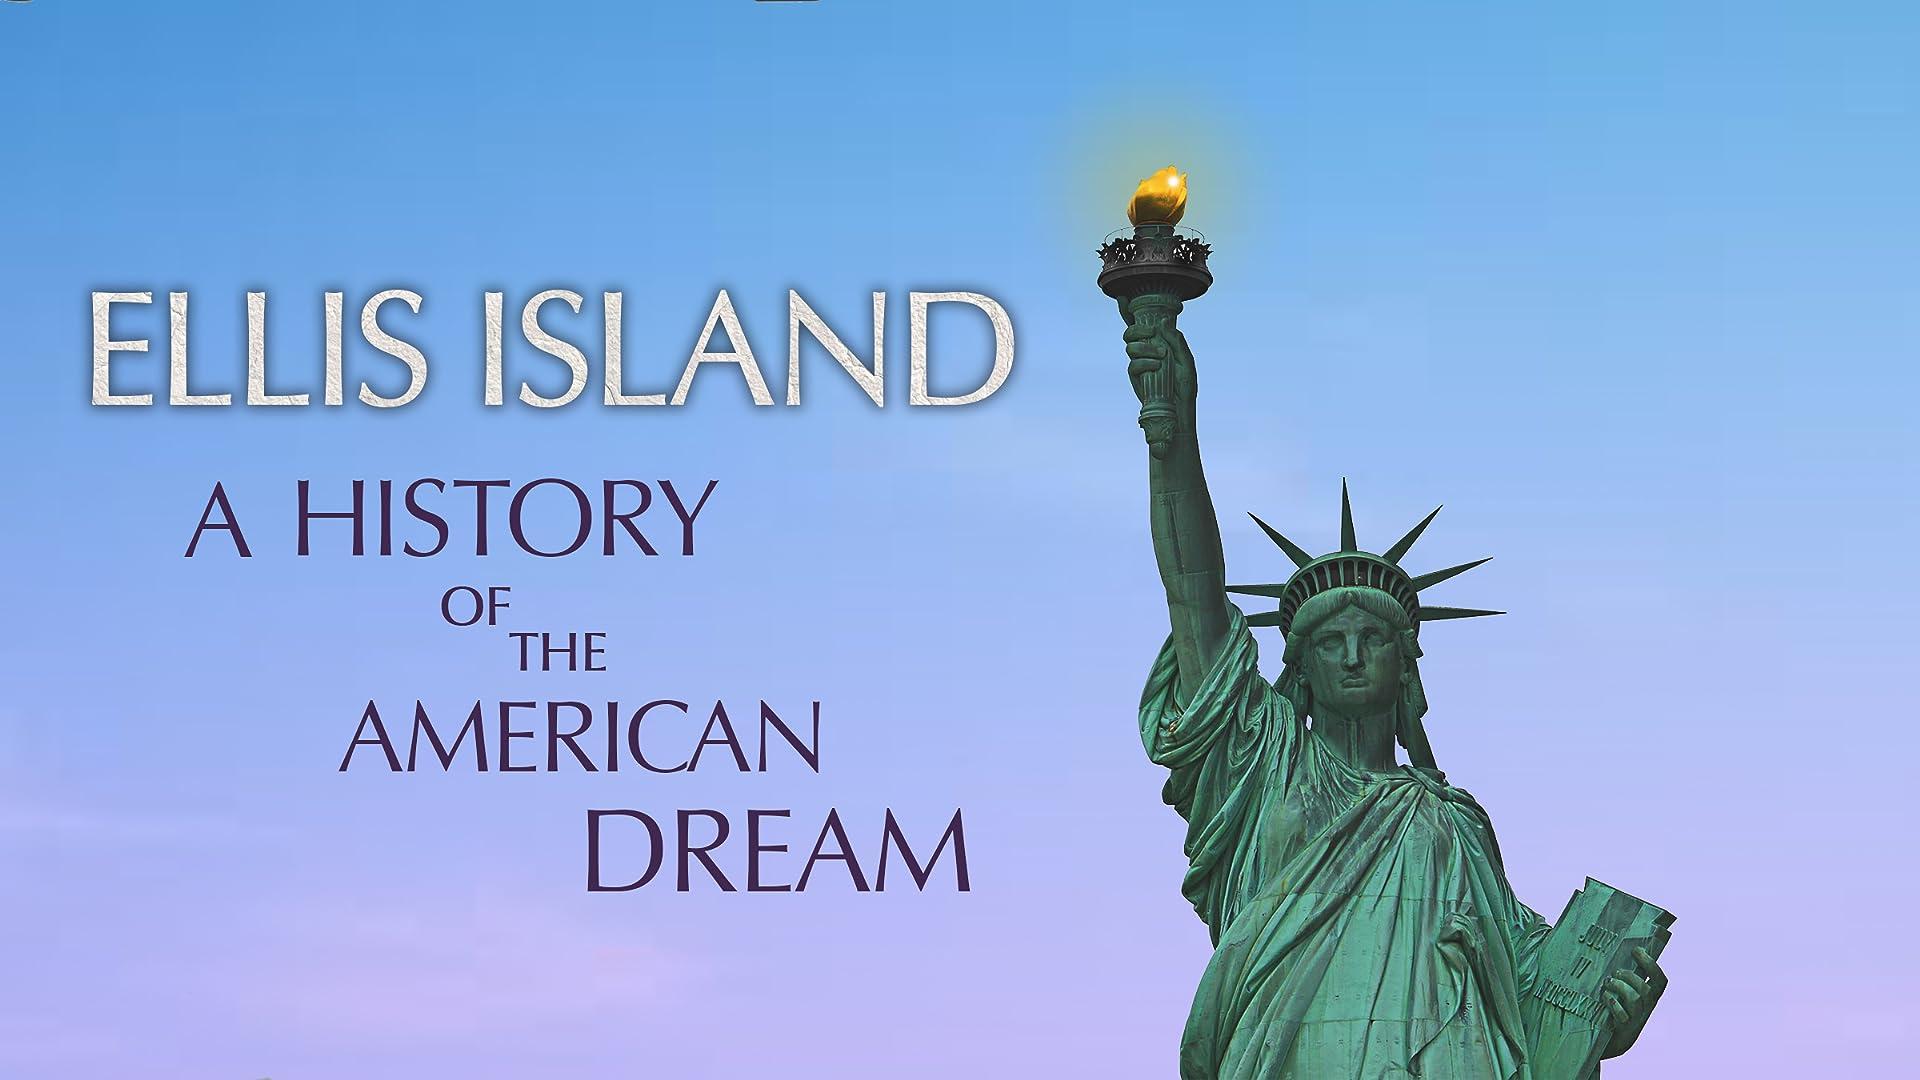 Ellis Island: A History of the American Dream